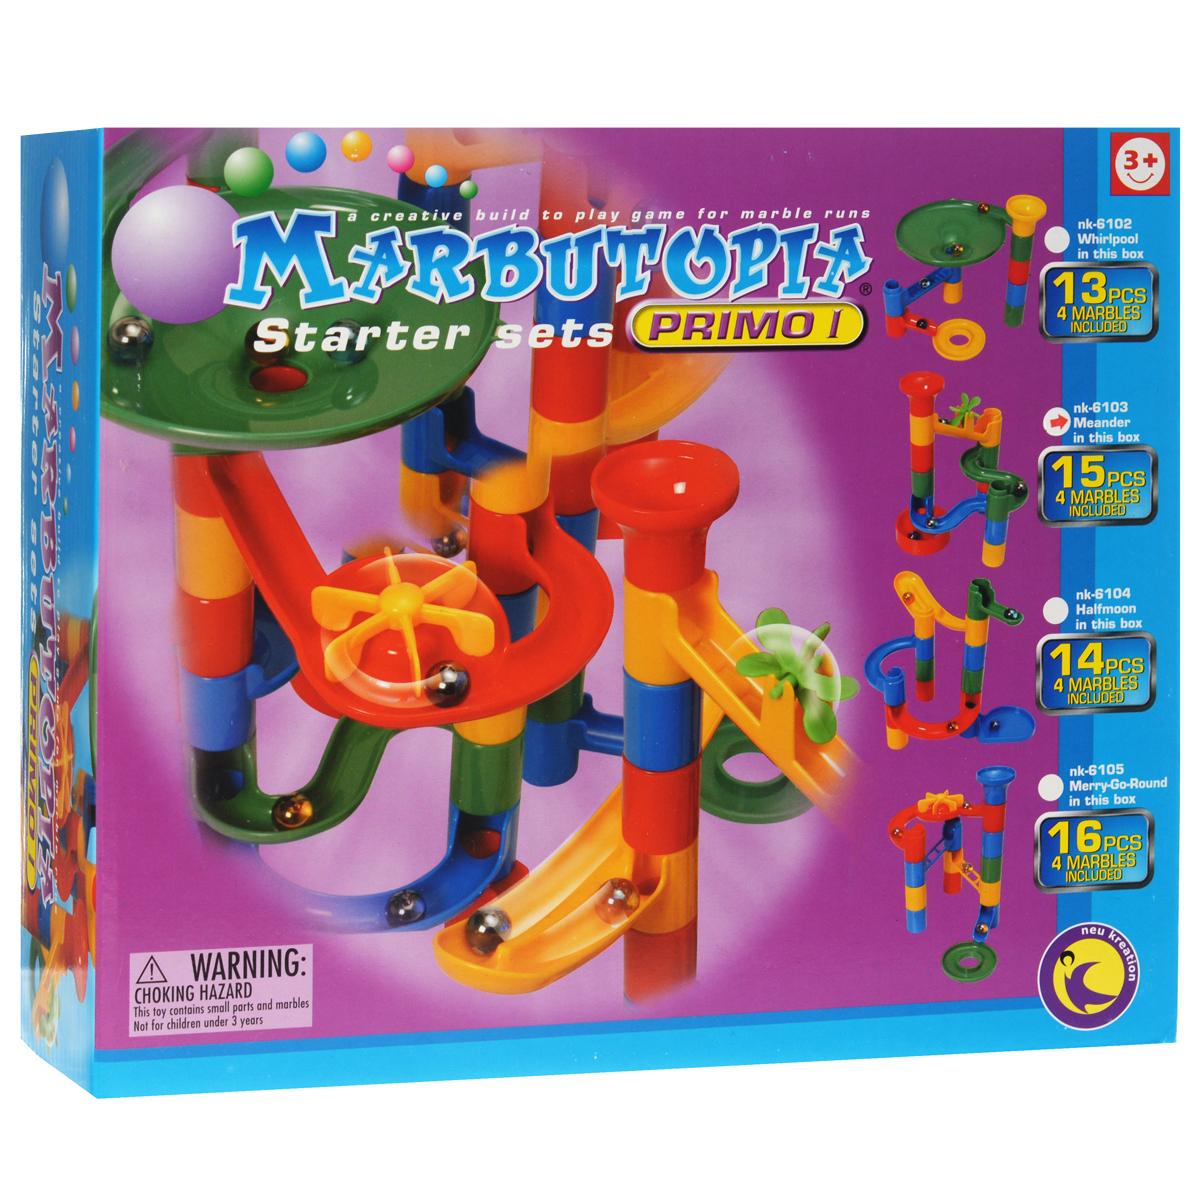 Marbutopia Конструктор Извилины напряги извилины